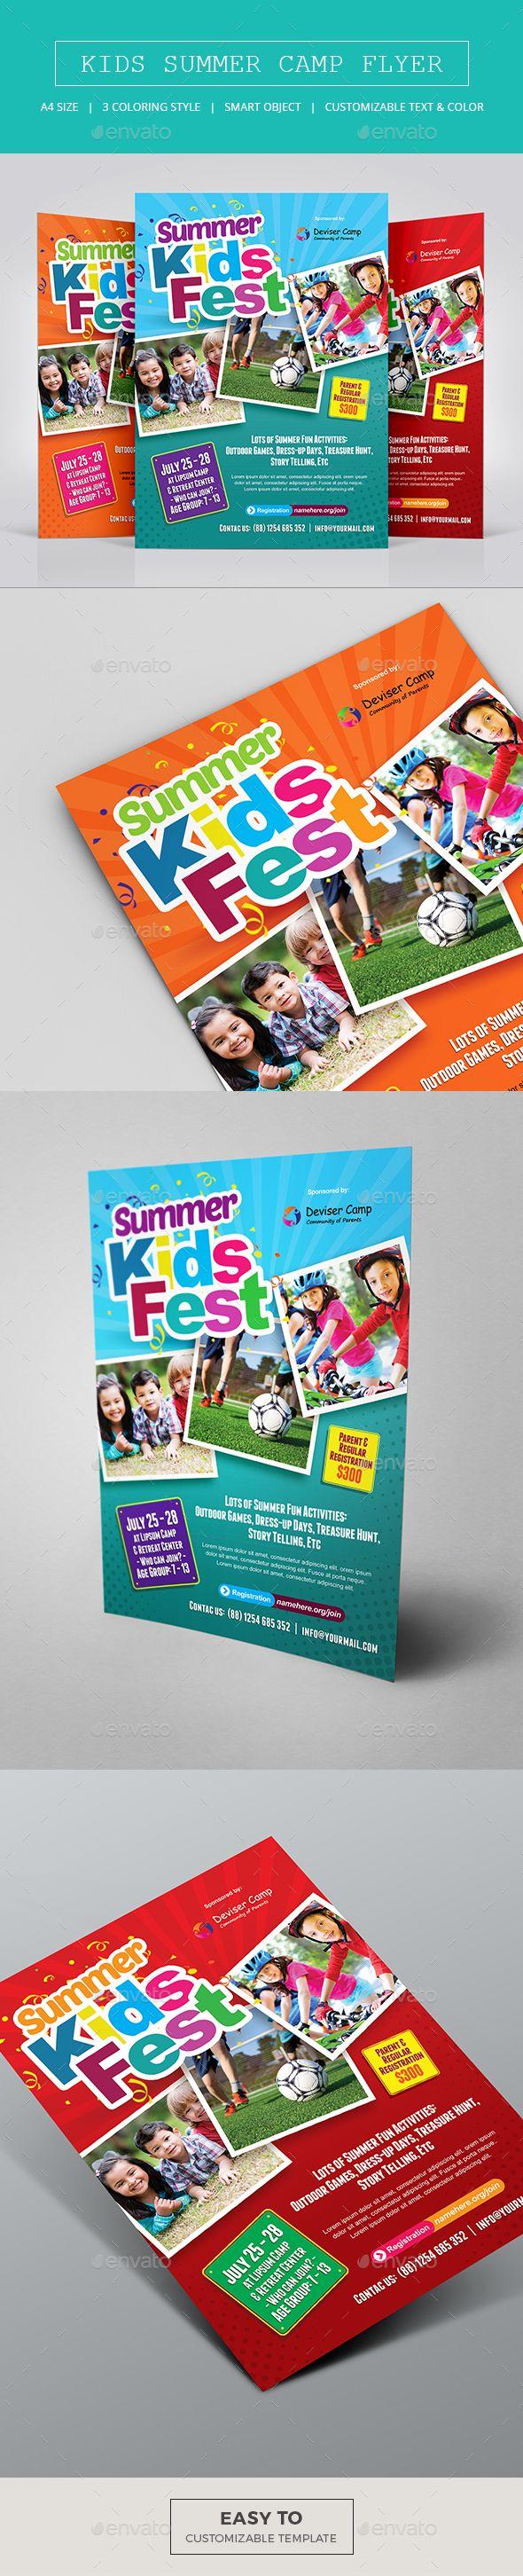 Kids Summer Camp Flyer Template PSD. Download here: http://graphicriver.net/item/kids-summer-camp-flyer-/15842918?ref=ksioks